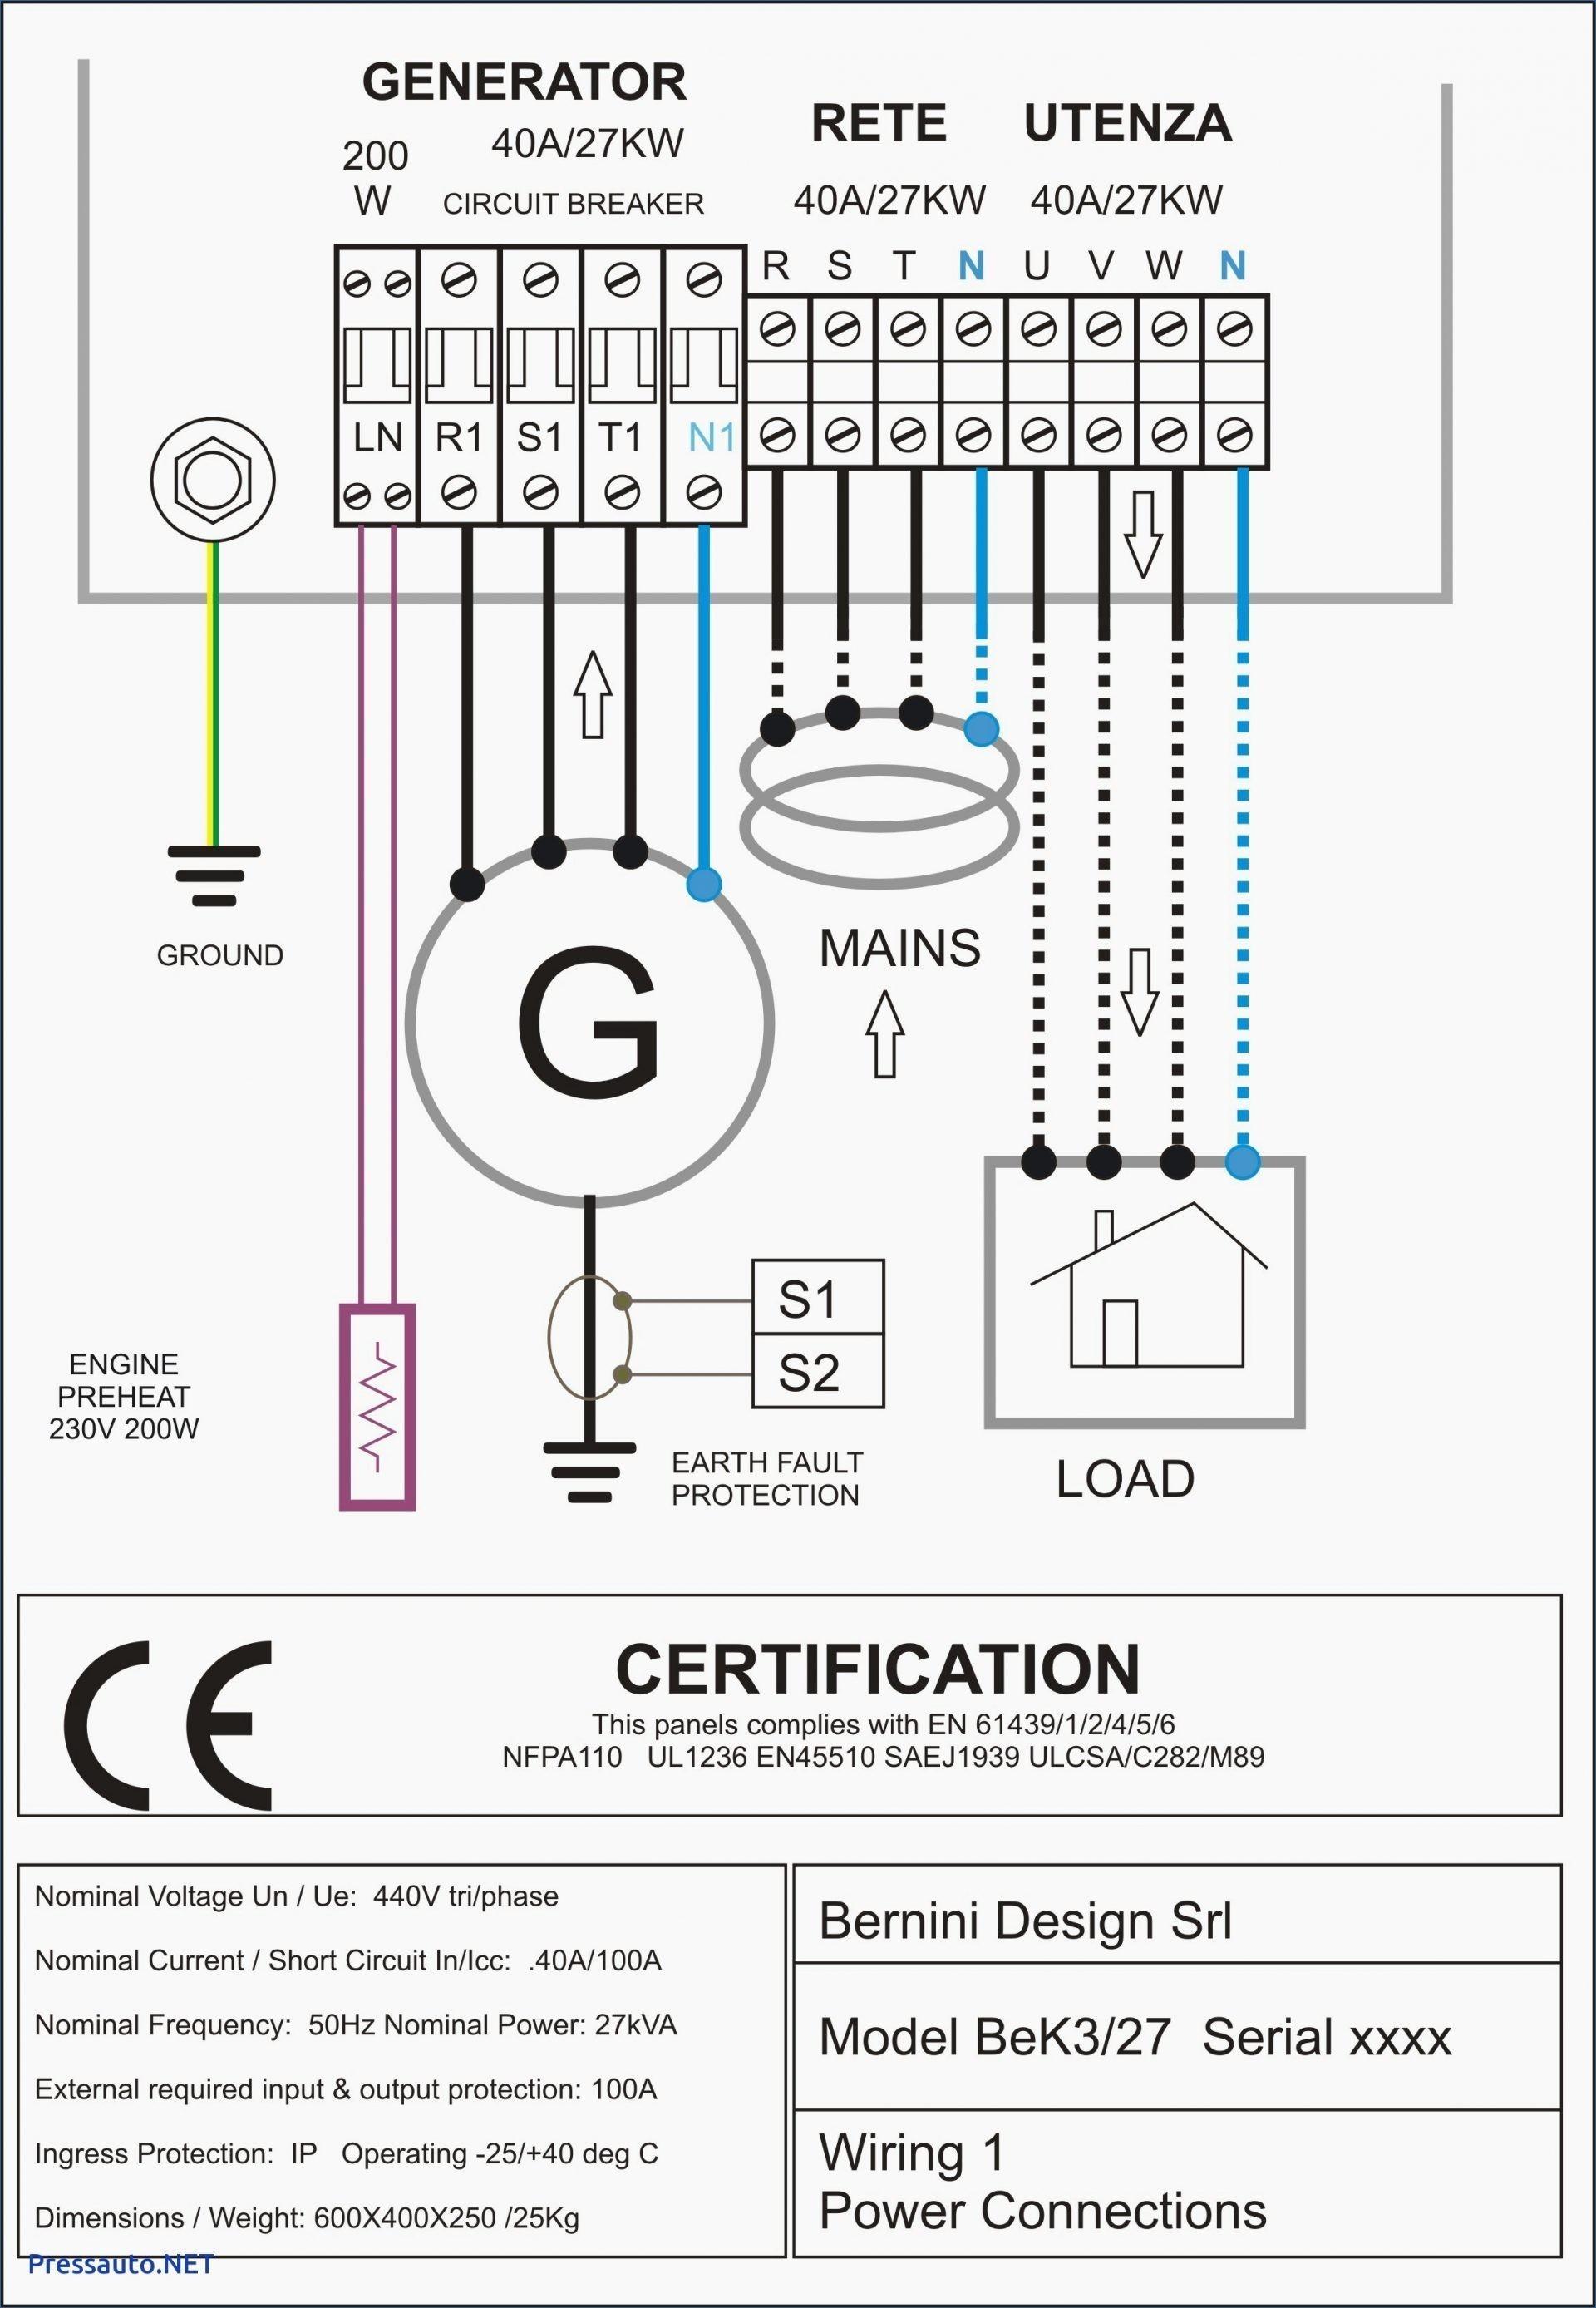 wiring diagram for alternator - wiring diagram directory generator to alternator wiring diagram mg generator alternator dust-central.de